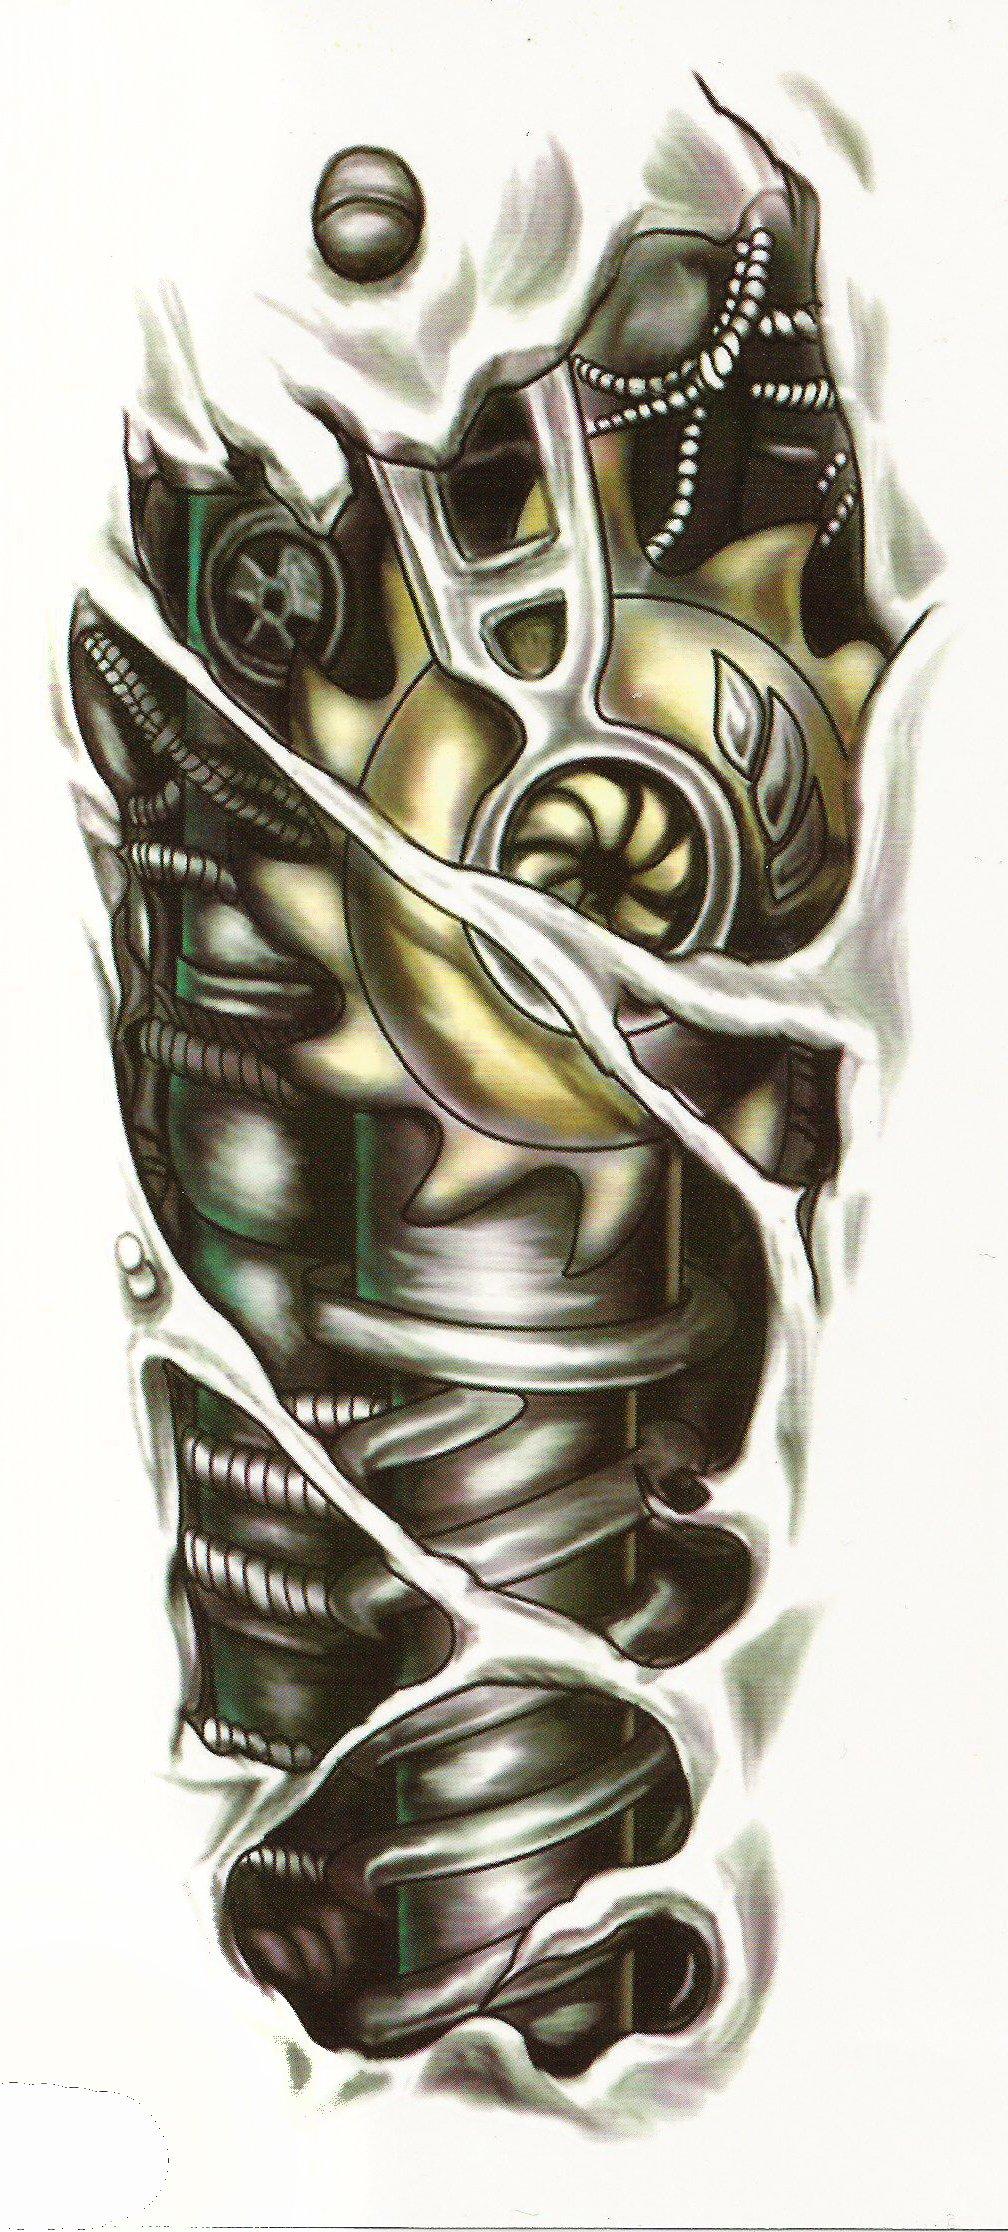 Tatuaż 3d Robot żółty Qs C058 6699960215 Oficjalne